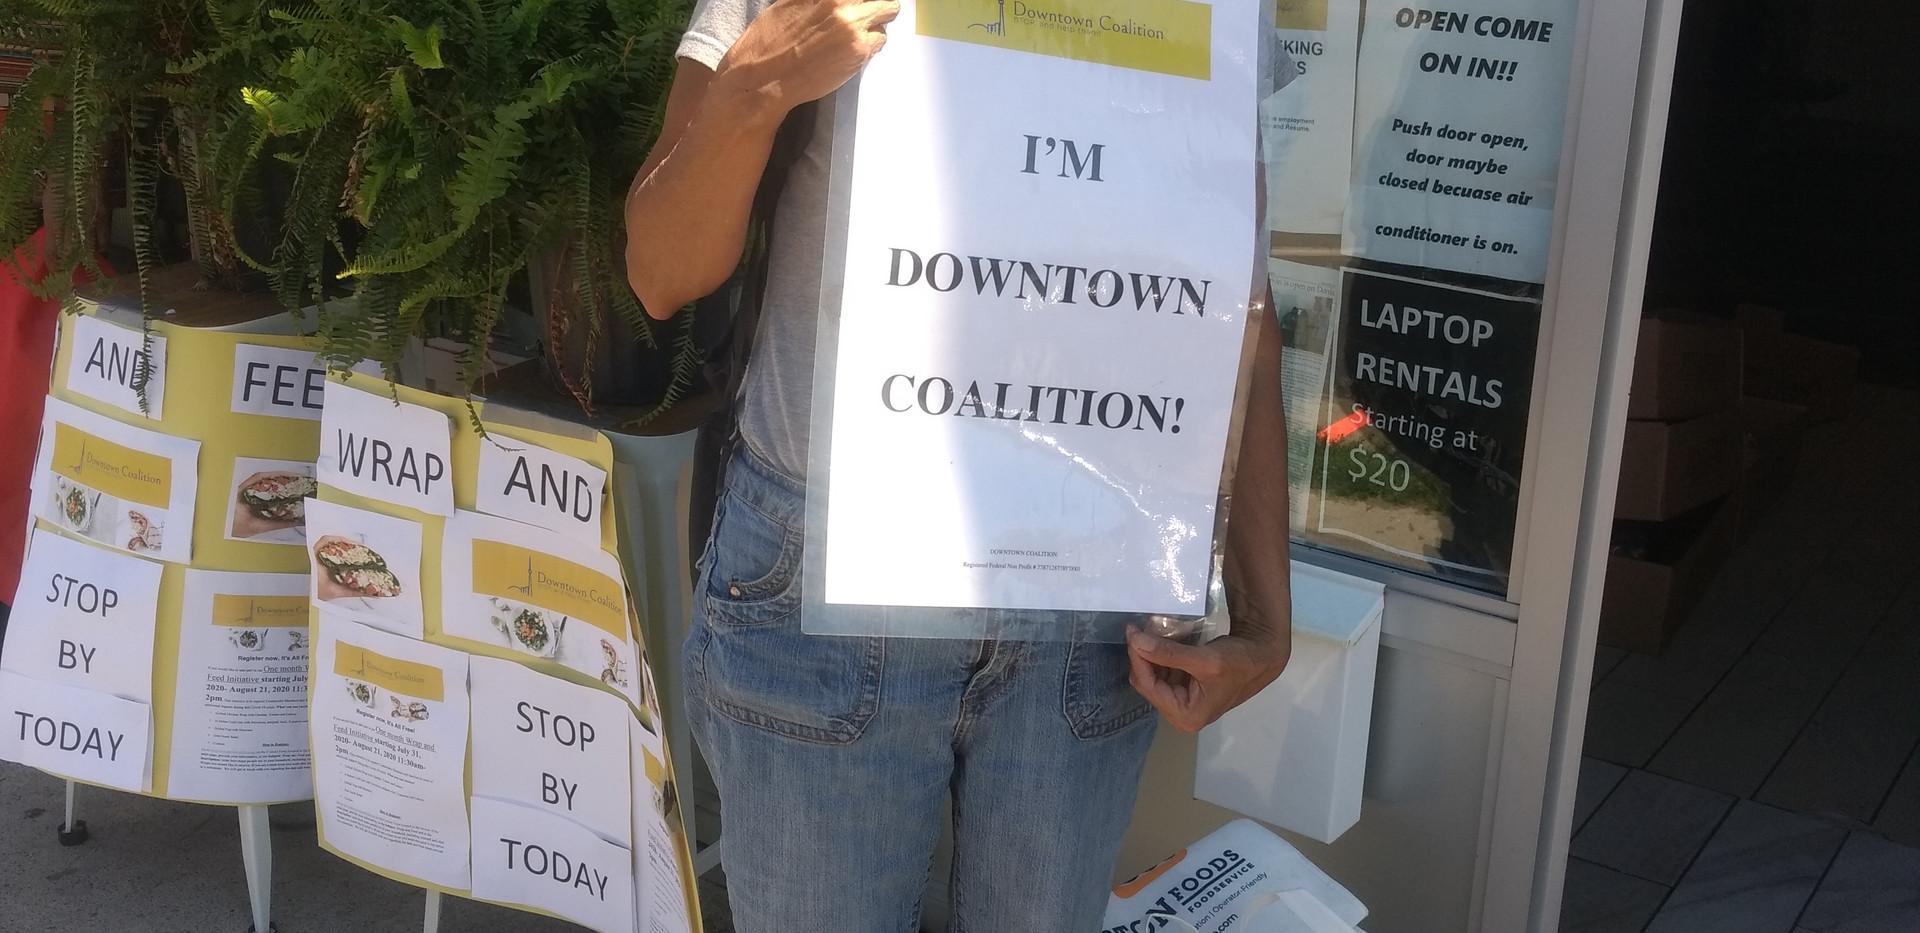 I am Downtown Coalition(2).jpg